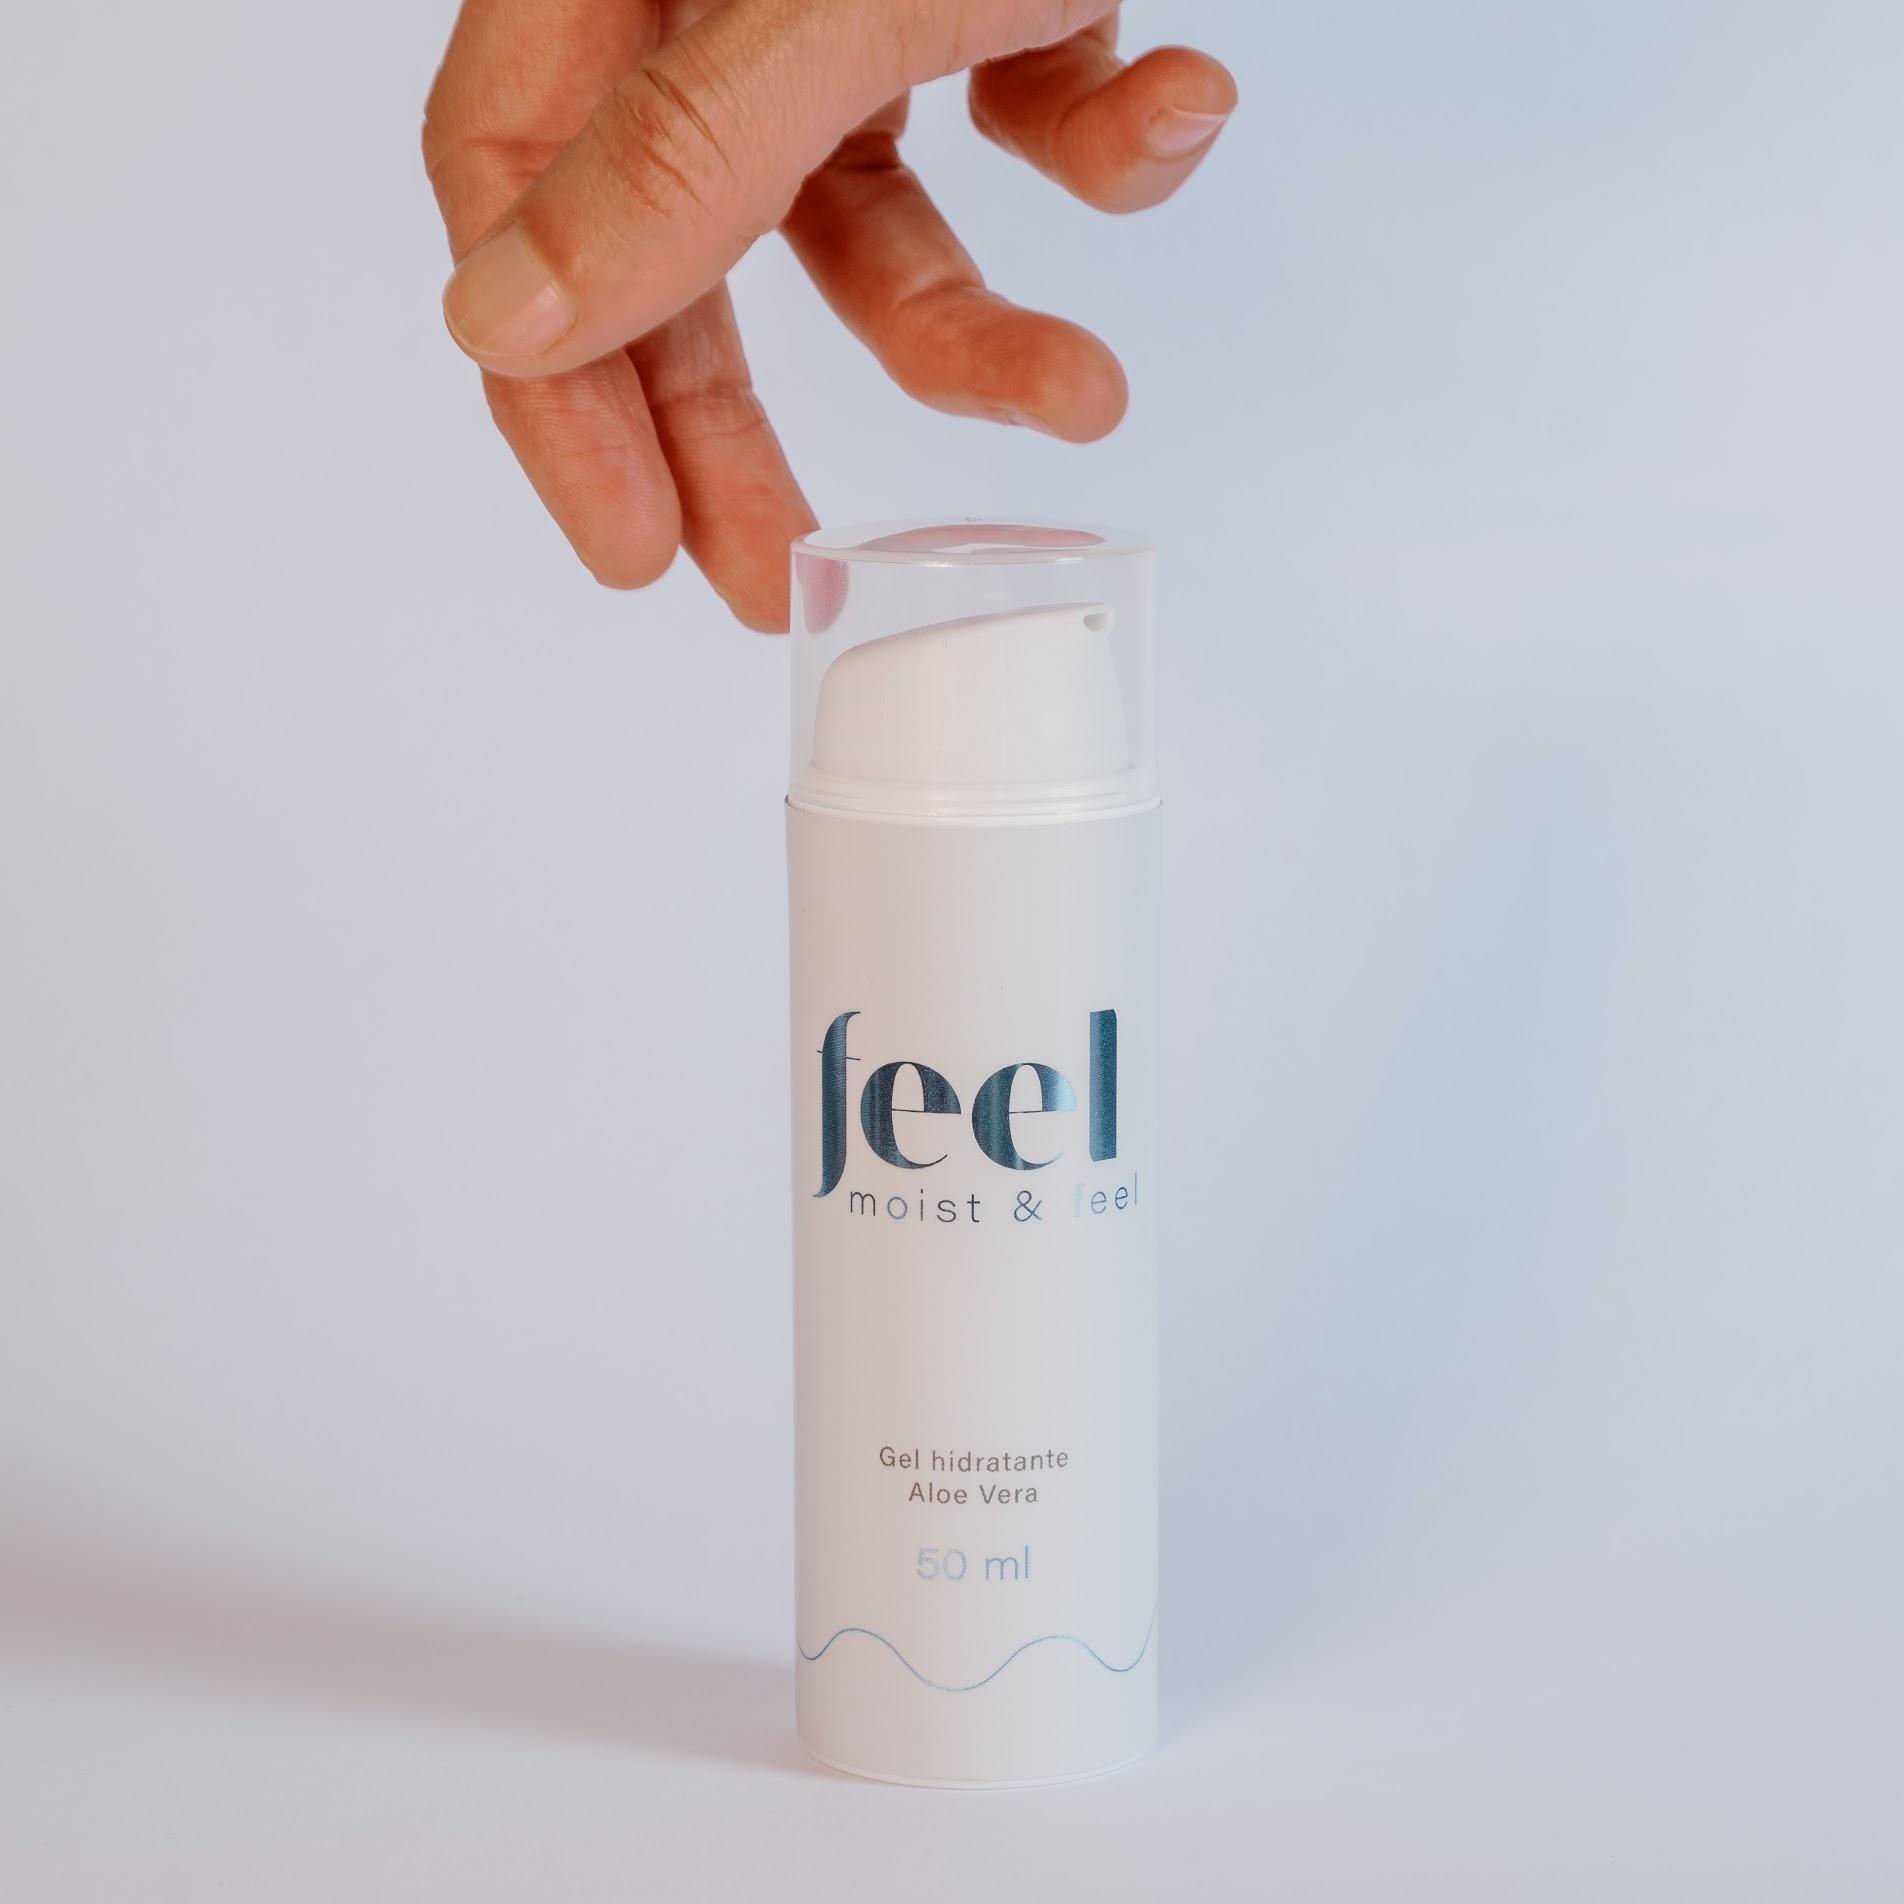 Kit Moist & Relief